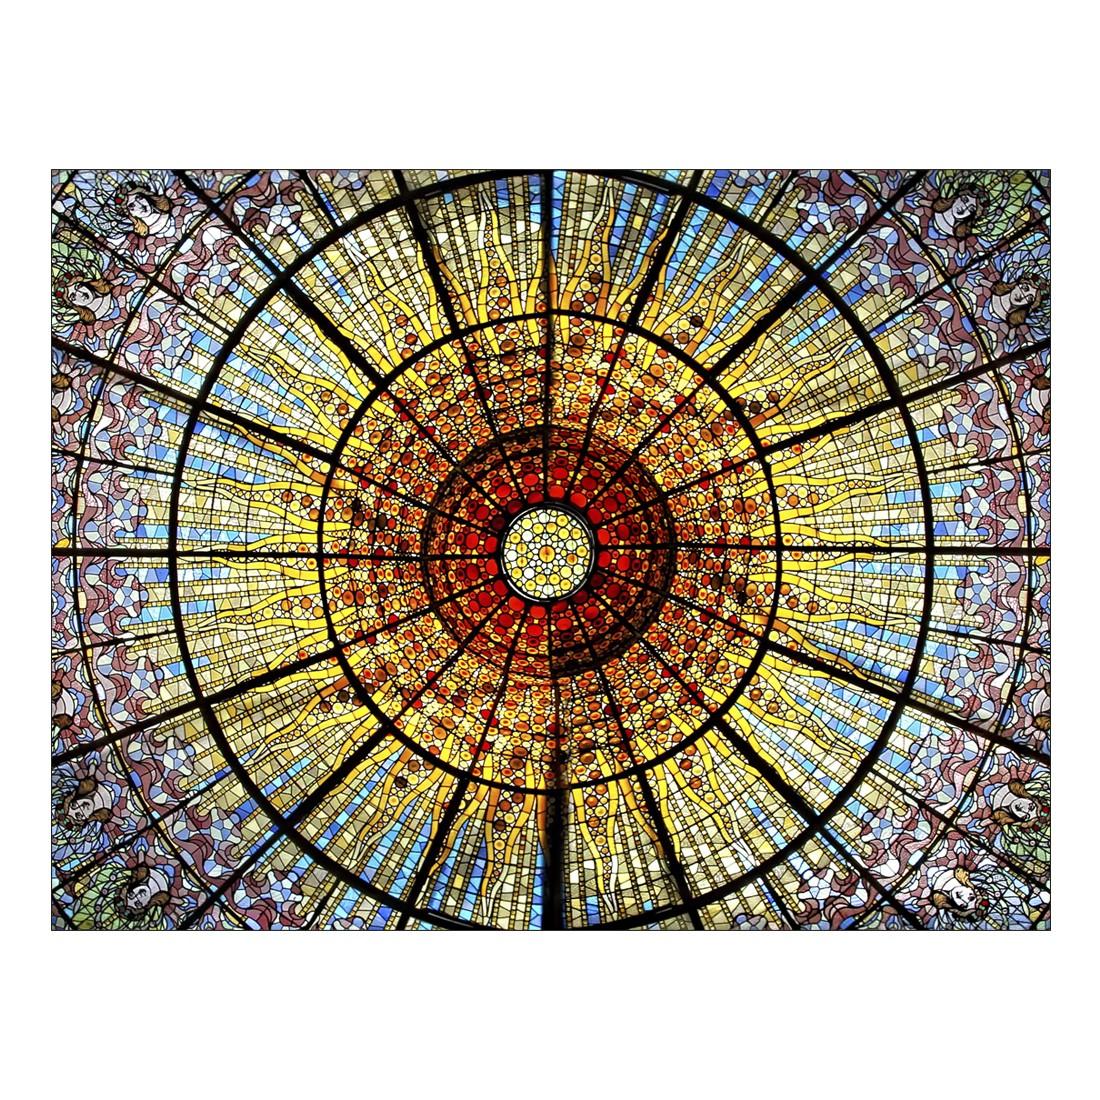 Leinwandbild COLOURFUL CHURCH ROOF – Abmessung 100 x 75 cm, Gallery of Innovative Art günstig